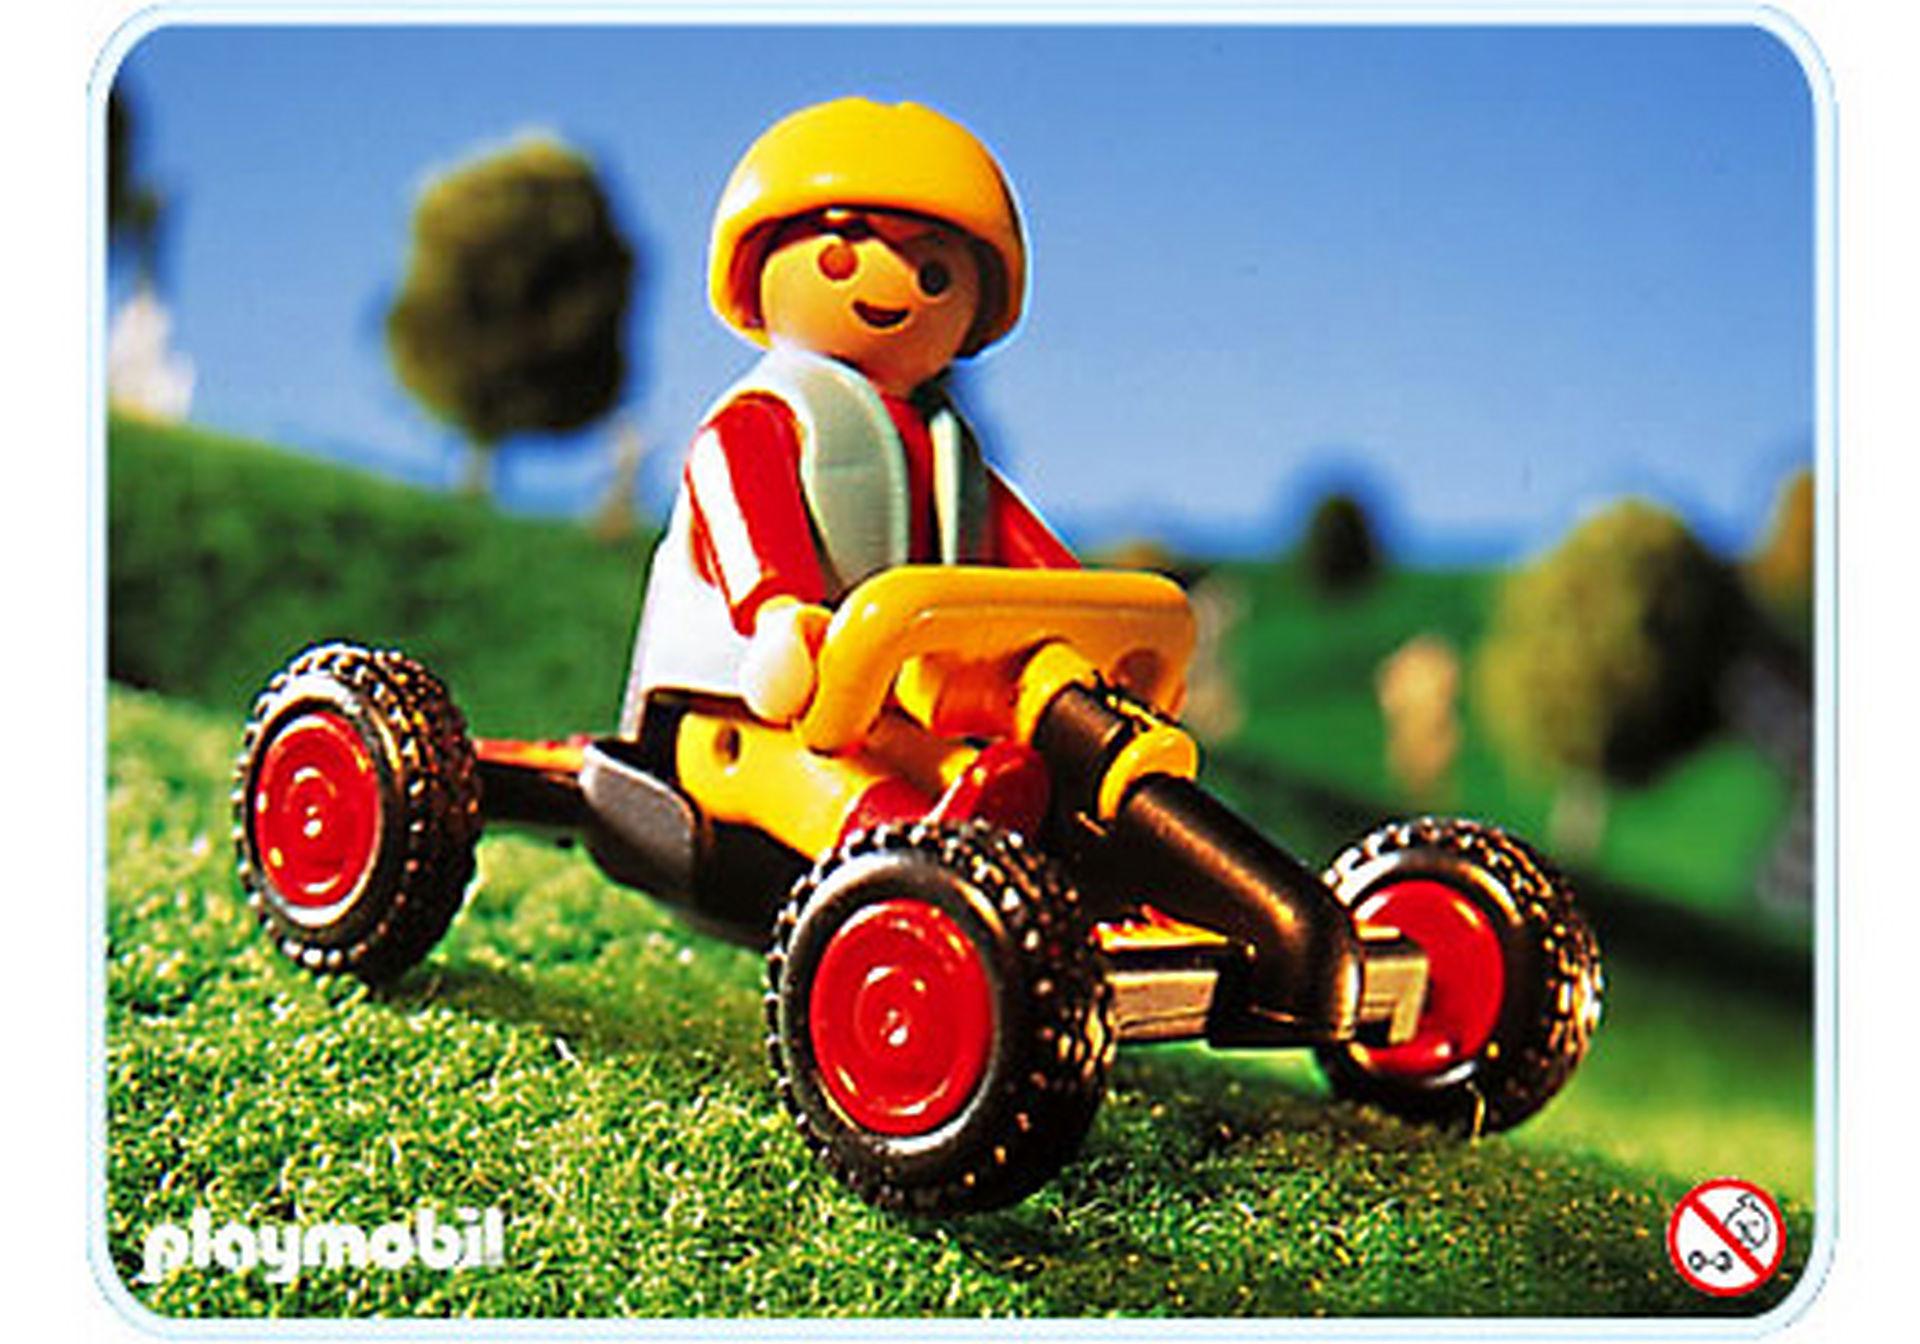 4510-A Pilote de kart zoom image1